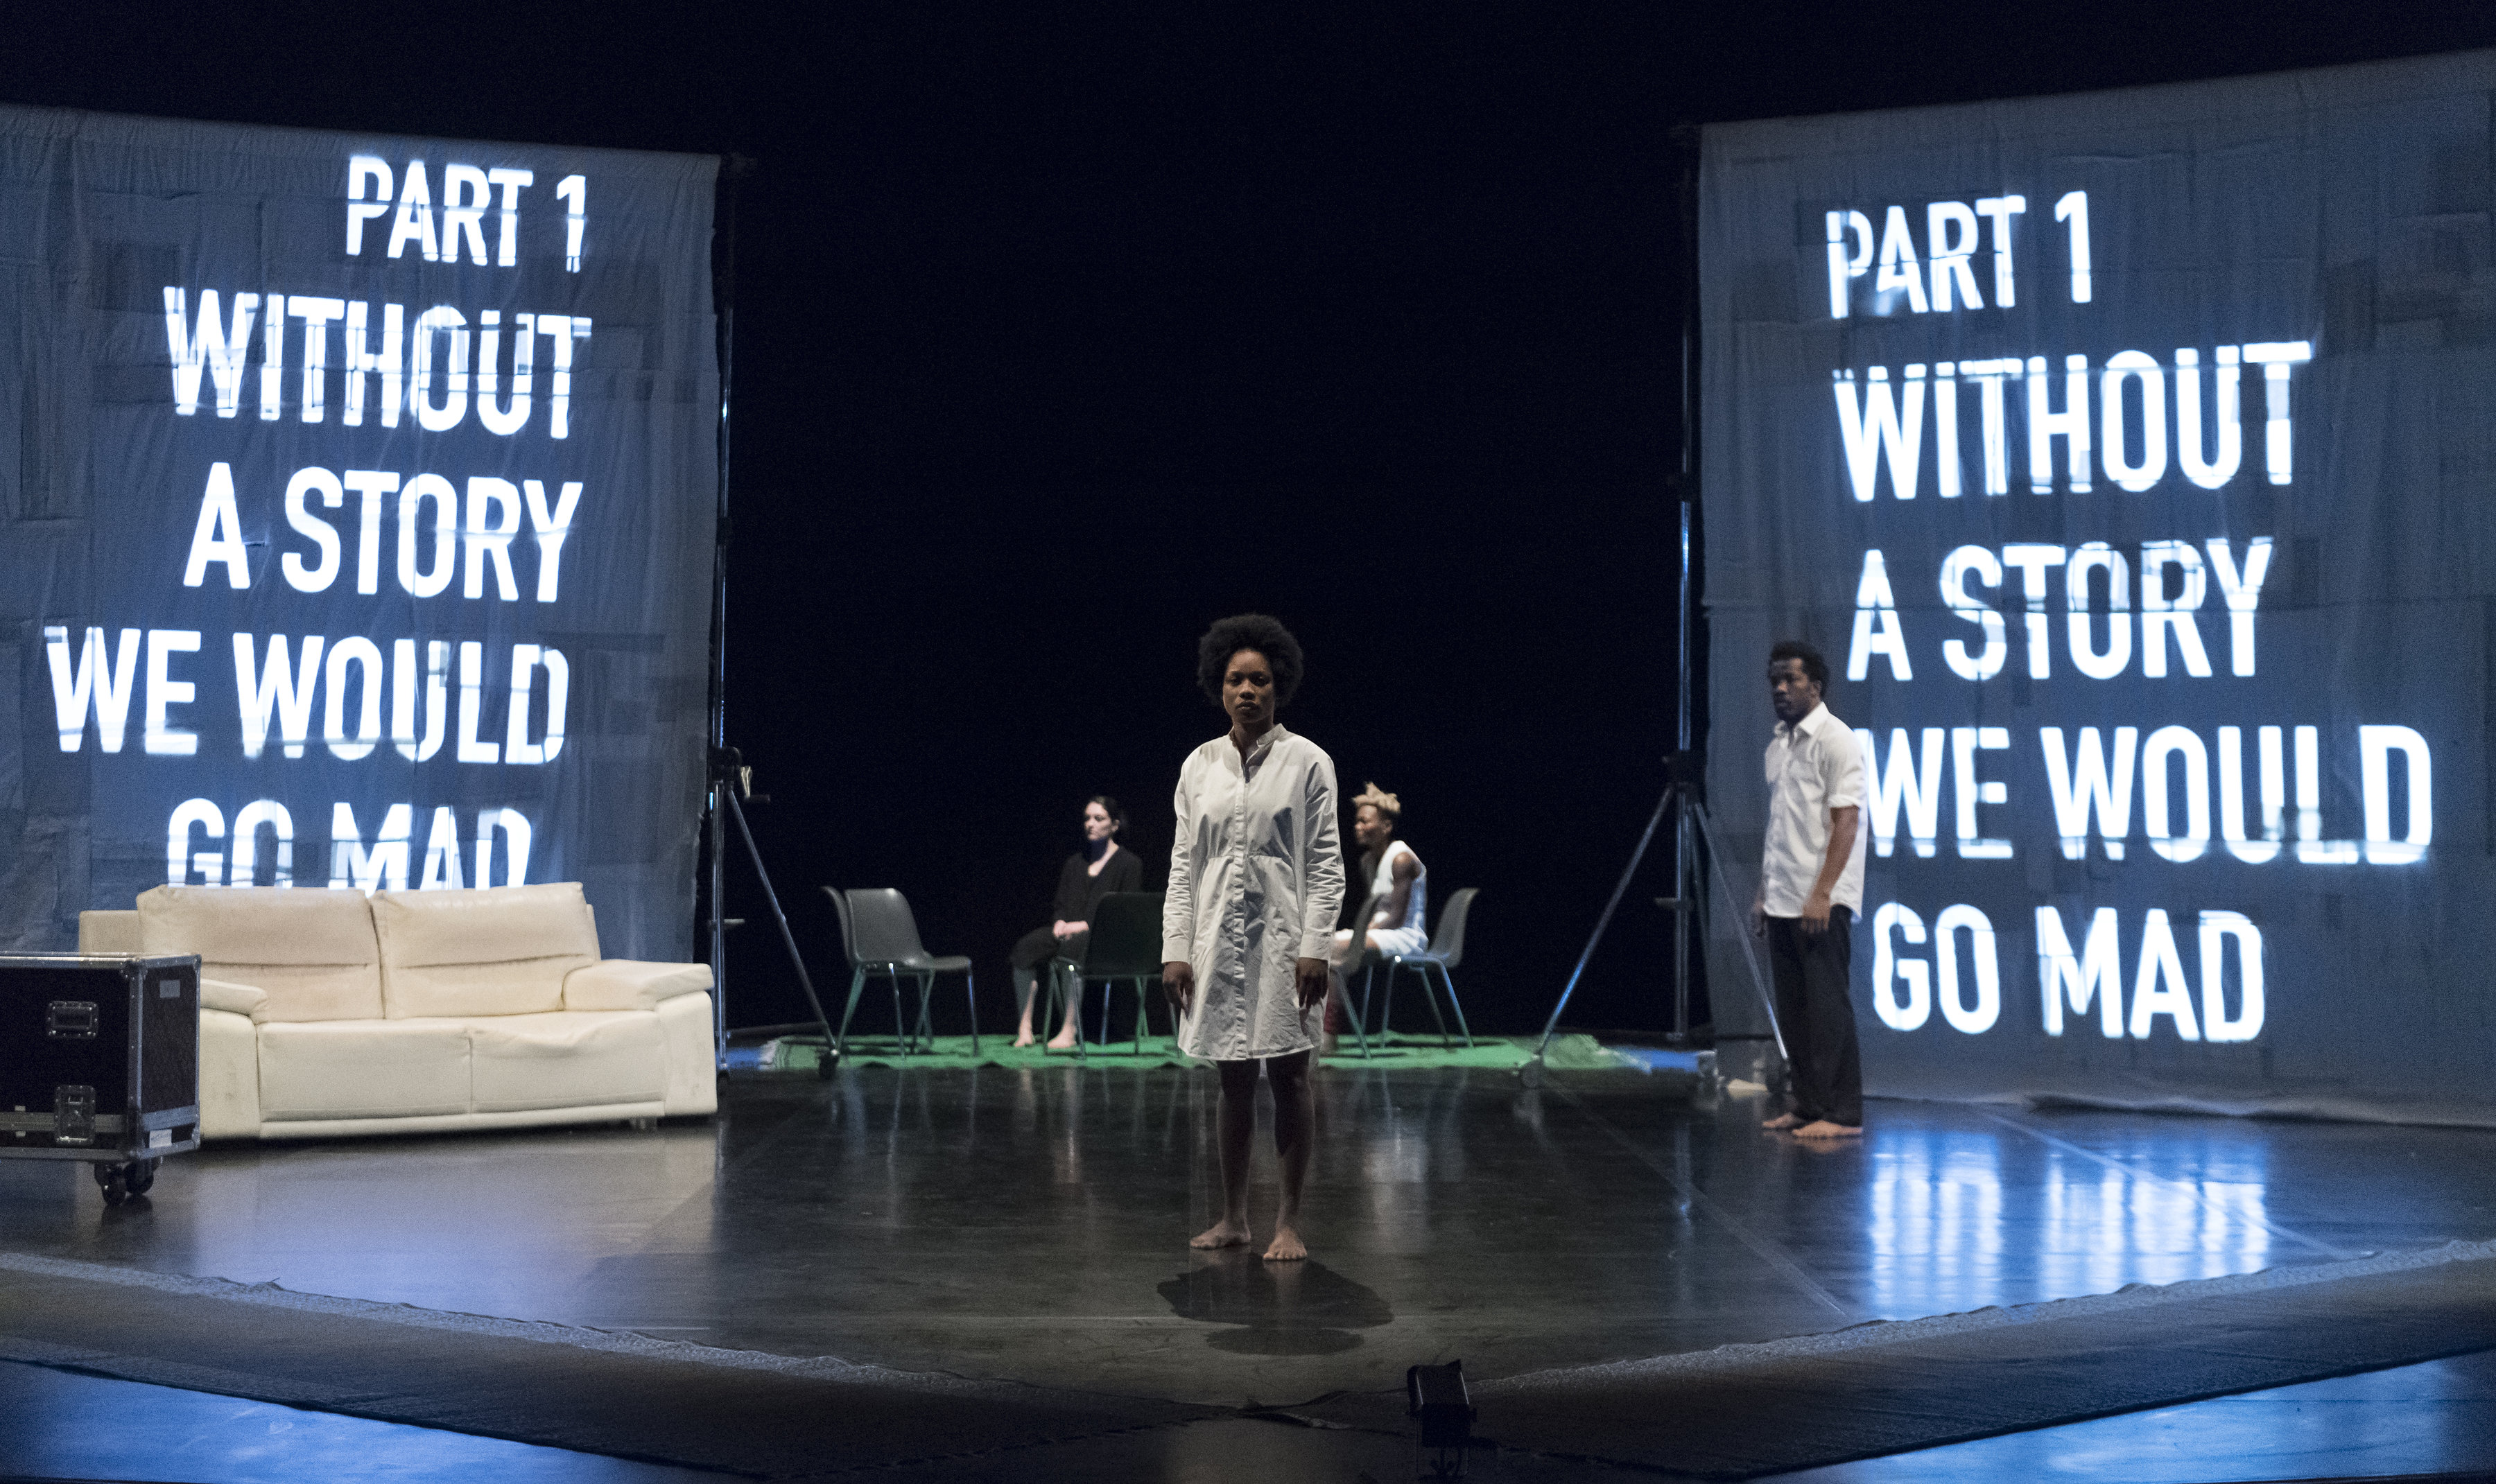 Faso Danse Théâtre & Halles de Schaerbeek/Serge Aimé Coulibaly, Kalakuta Republik; Marion Alzieu, Ida Faho, Antonia Naouele, Sayouba Sigué. Image credit: Doune Photo